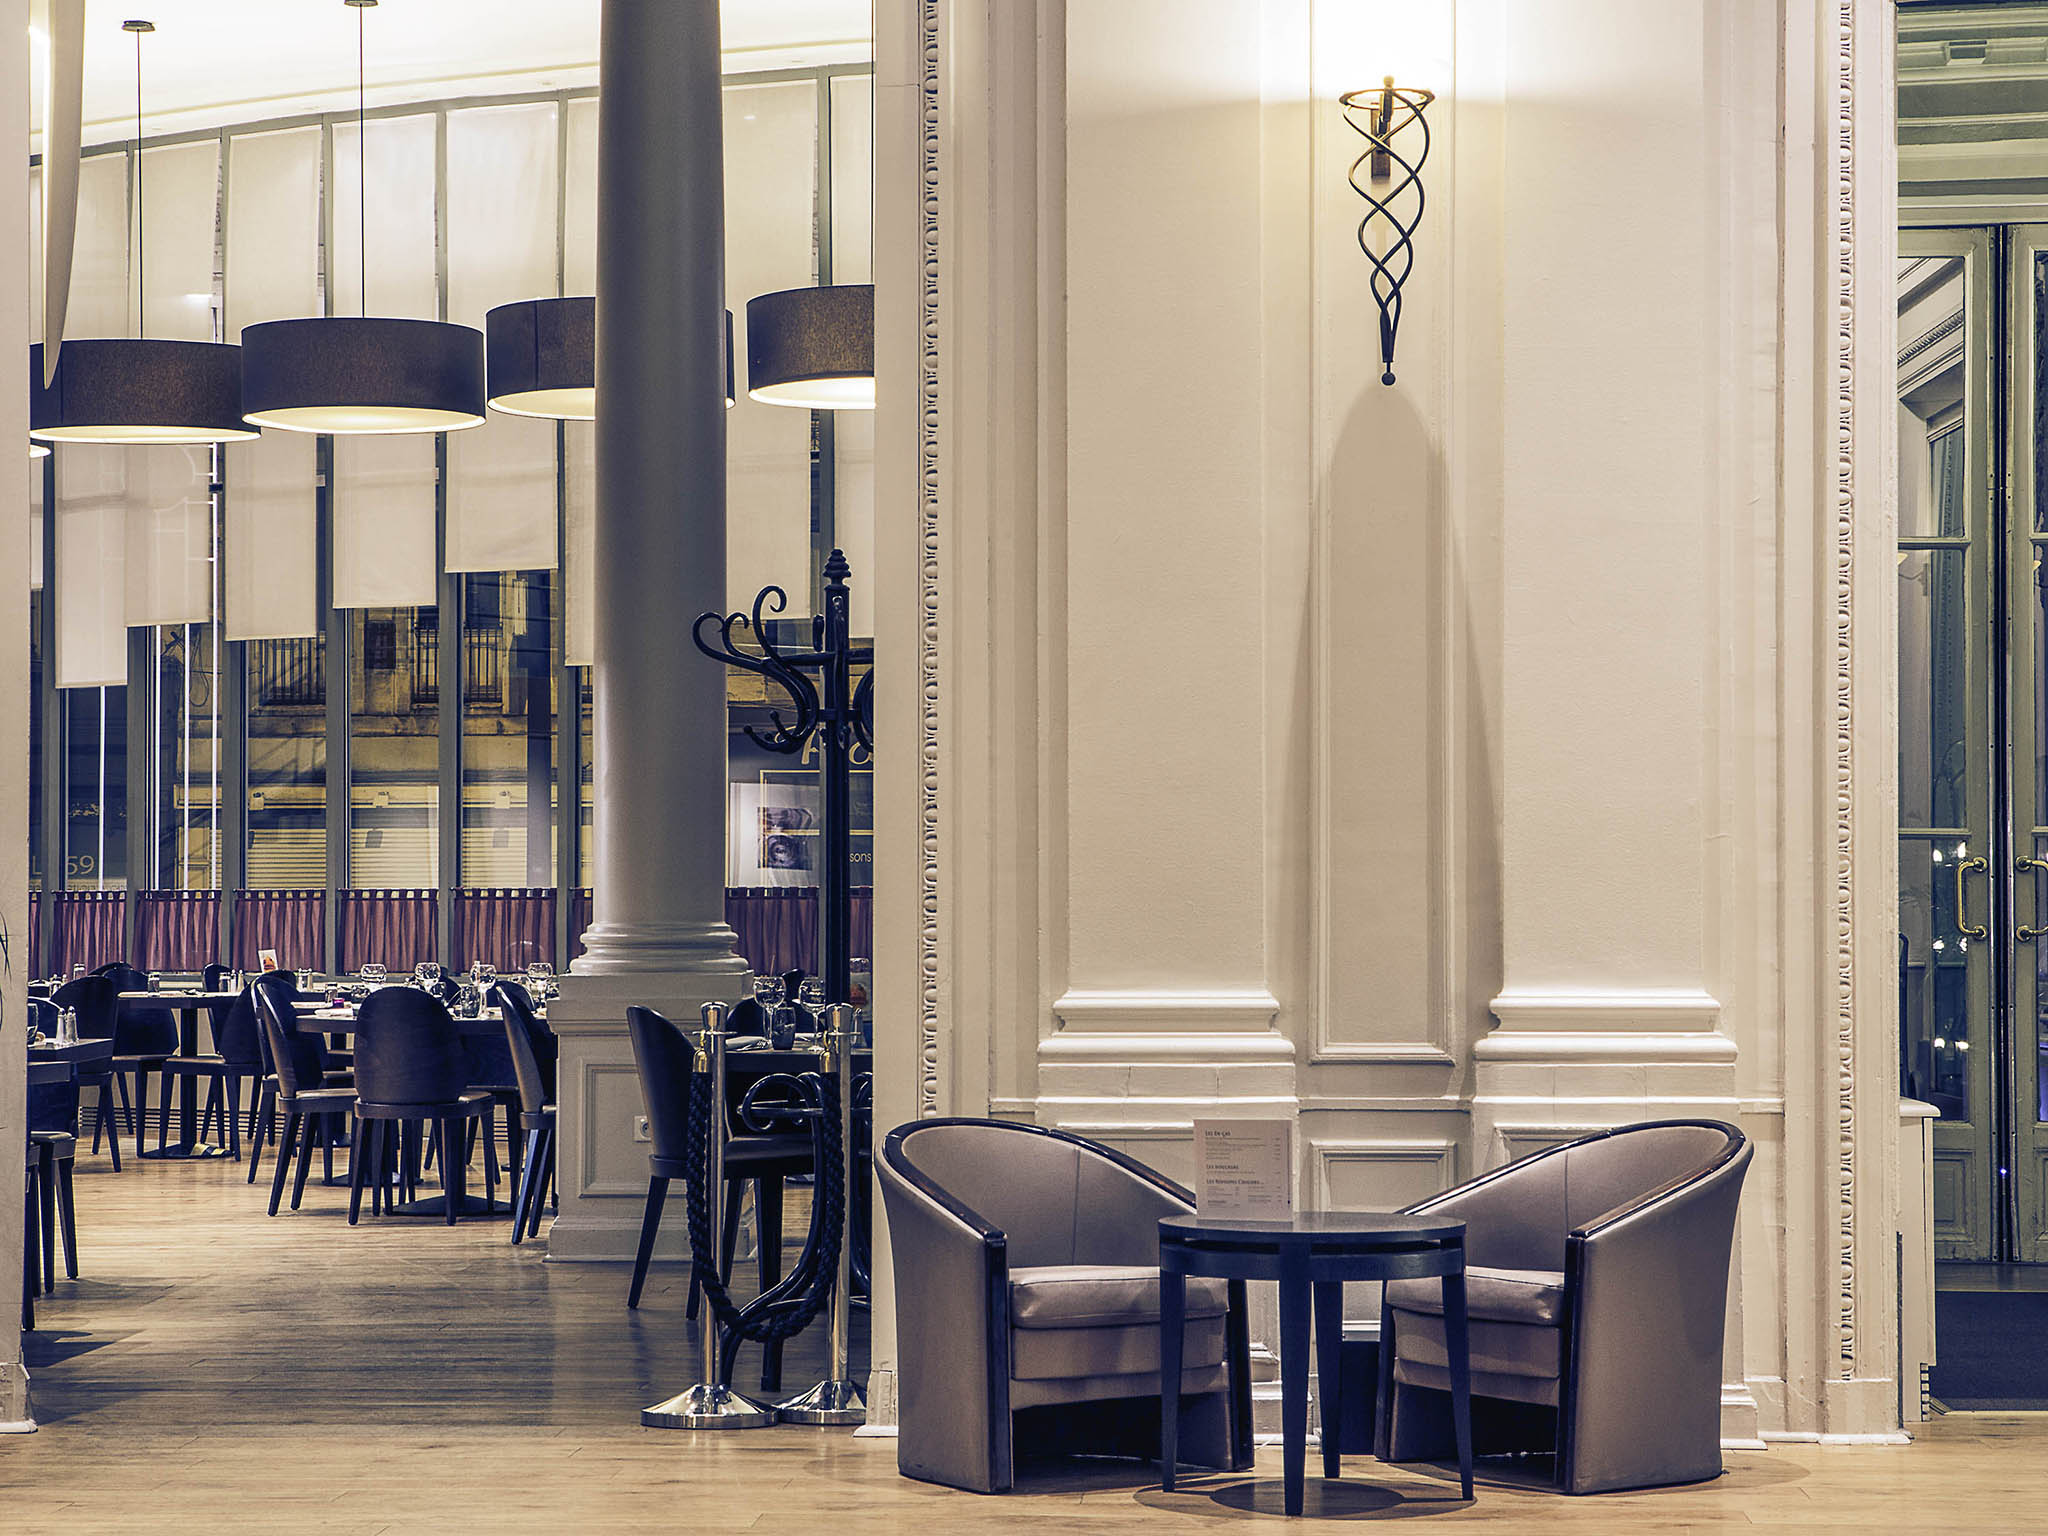 Hotell – Hôtel Mercure Lille Roubaix Grand Hôtel